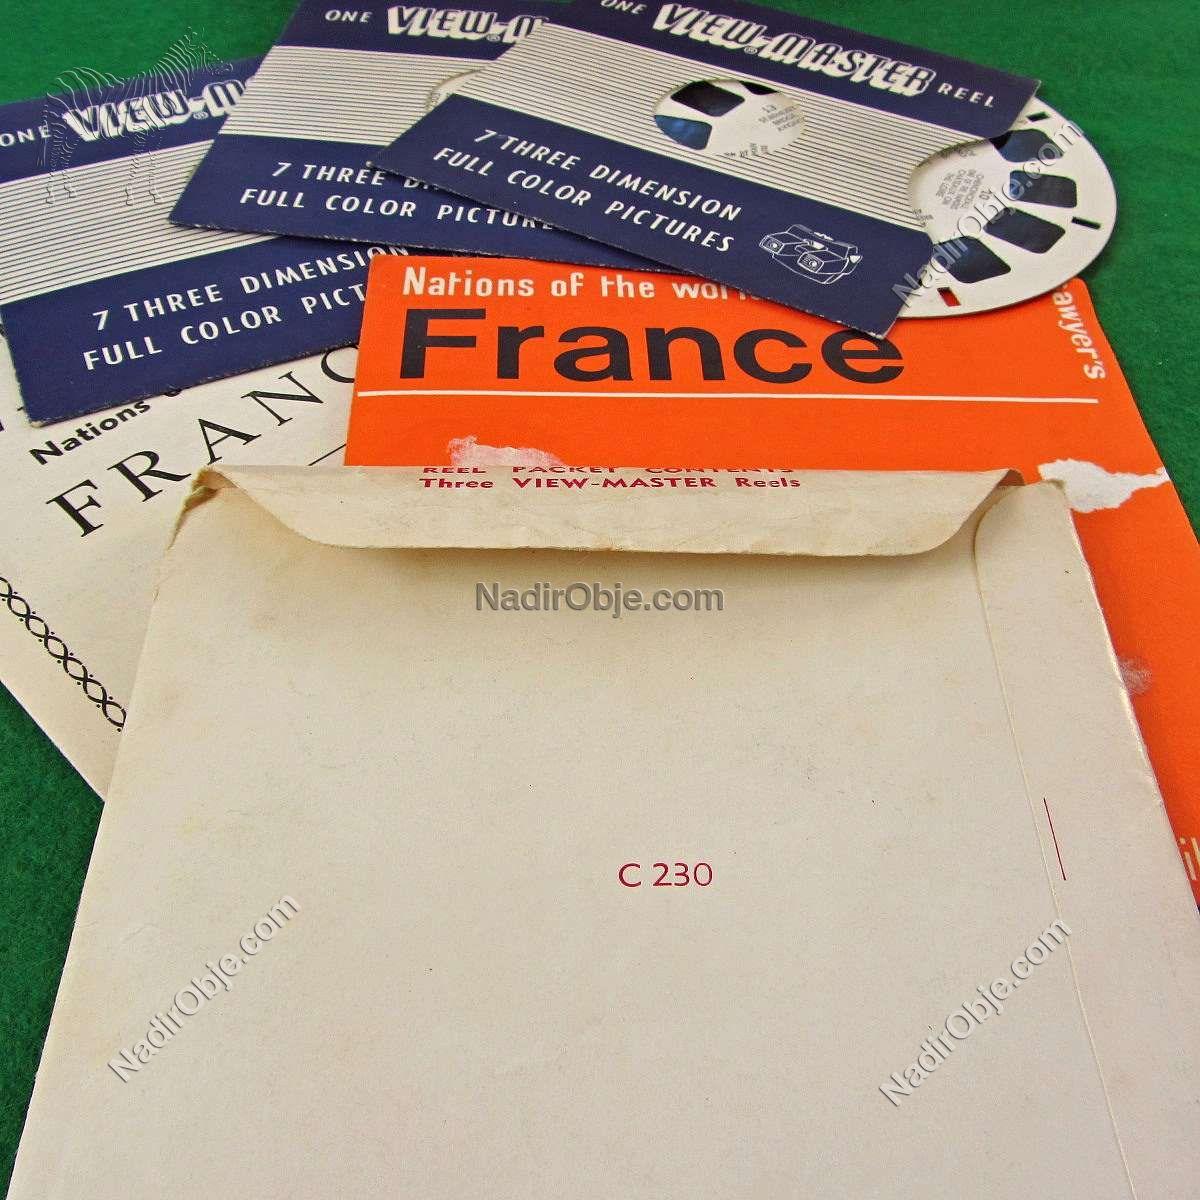 France View-Master Film Diğer Objeler 3Boyutlu